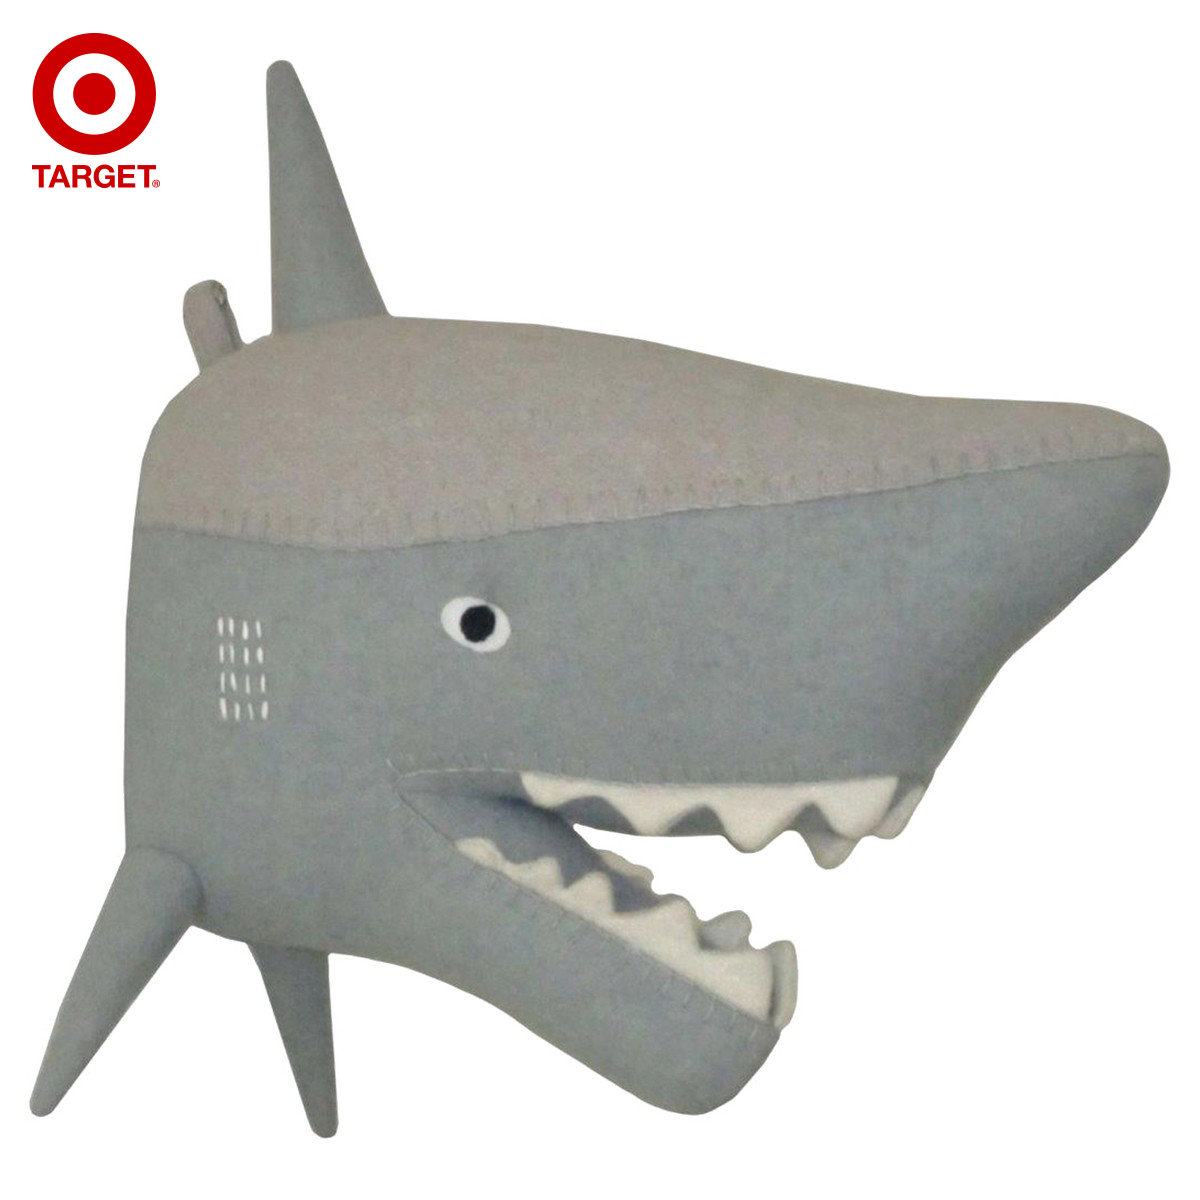 Сша Pillowfort ткань даже акула глава стена на искусство декоративный статья домой декоративный статья